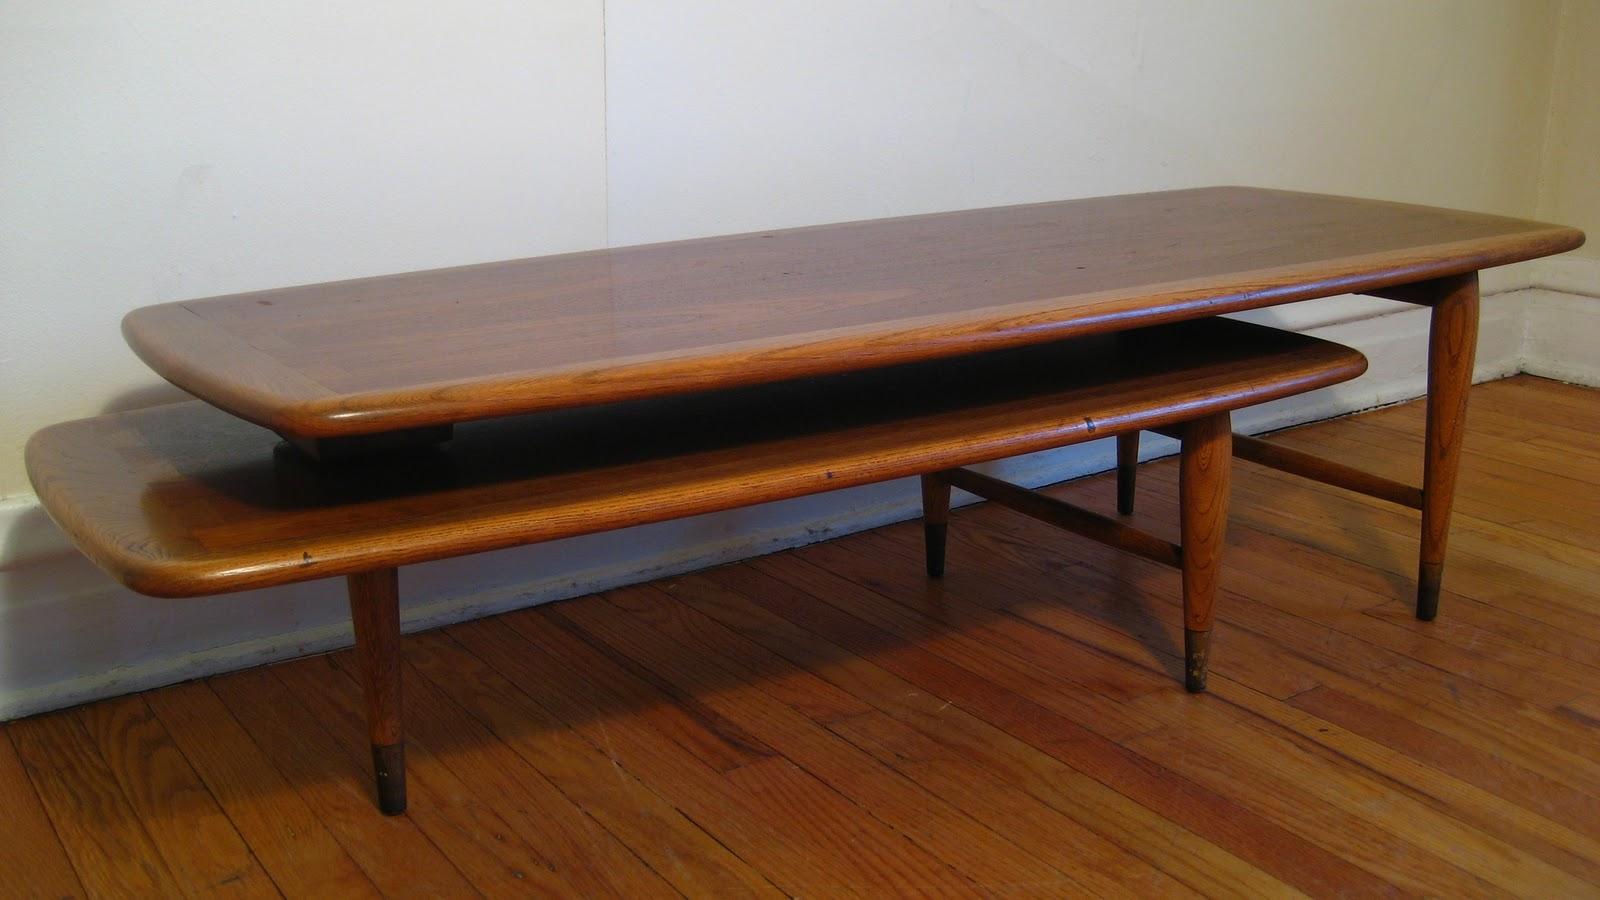 flatout design Lane Acclaim Swivel Table : laneacclaimswiveltable002 from flatoutdesign.blogspot.com size 1600 x 900 jpeg 147kB